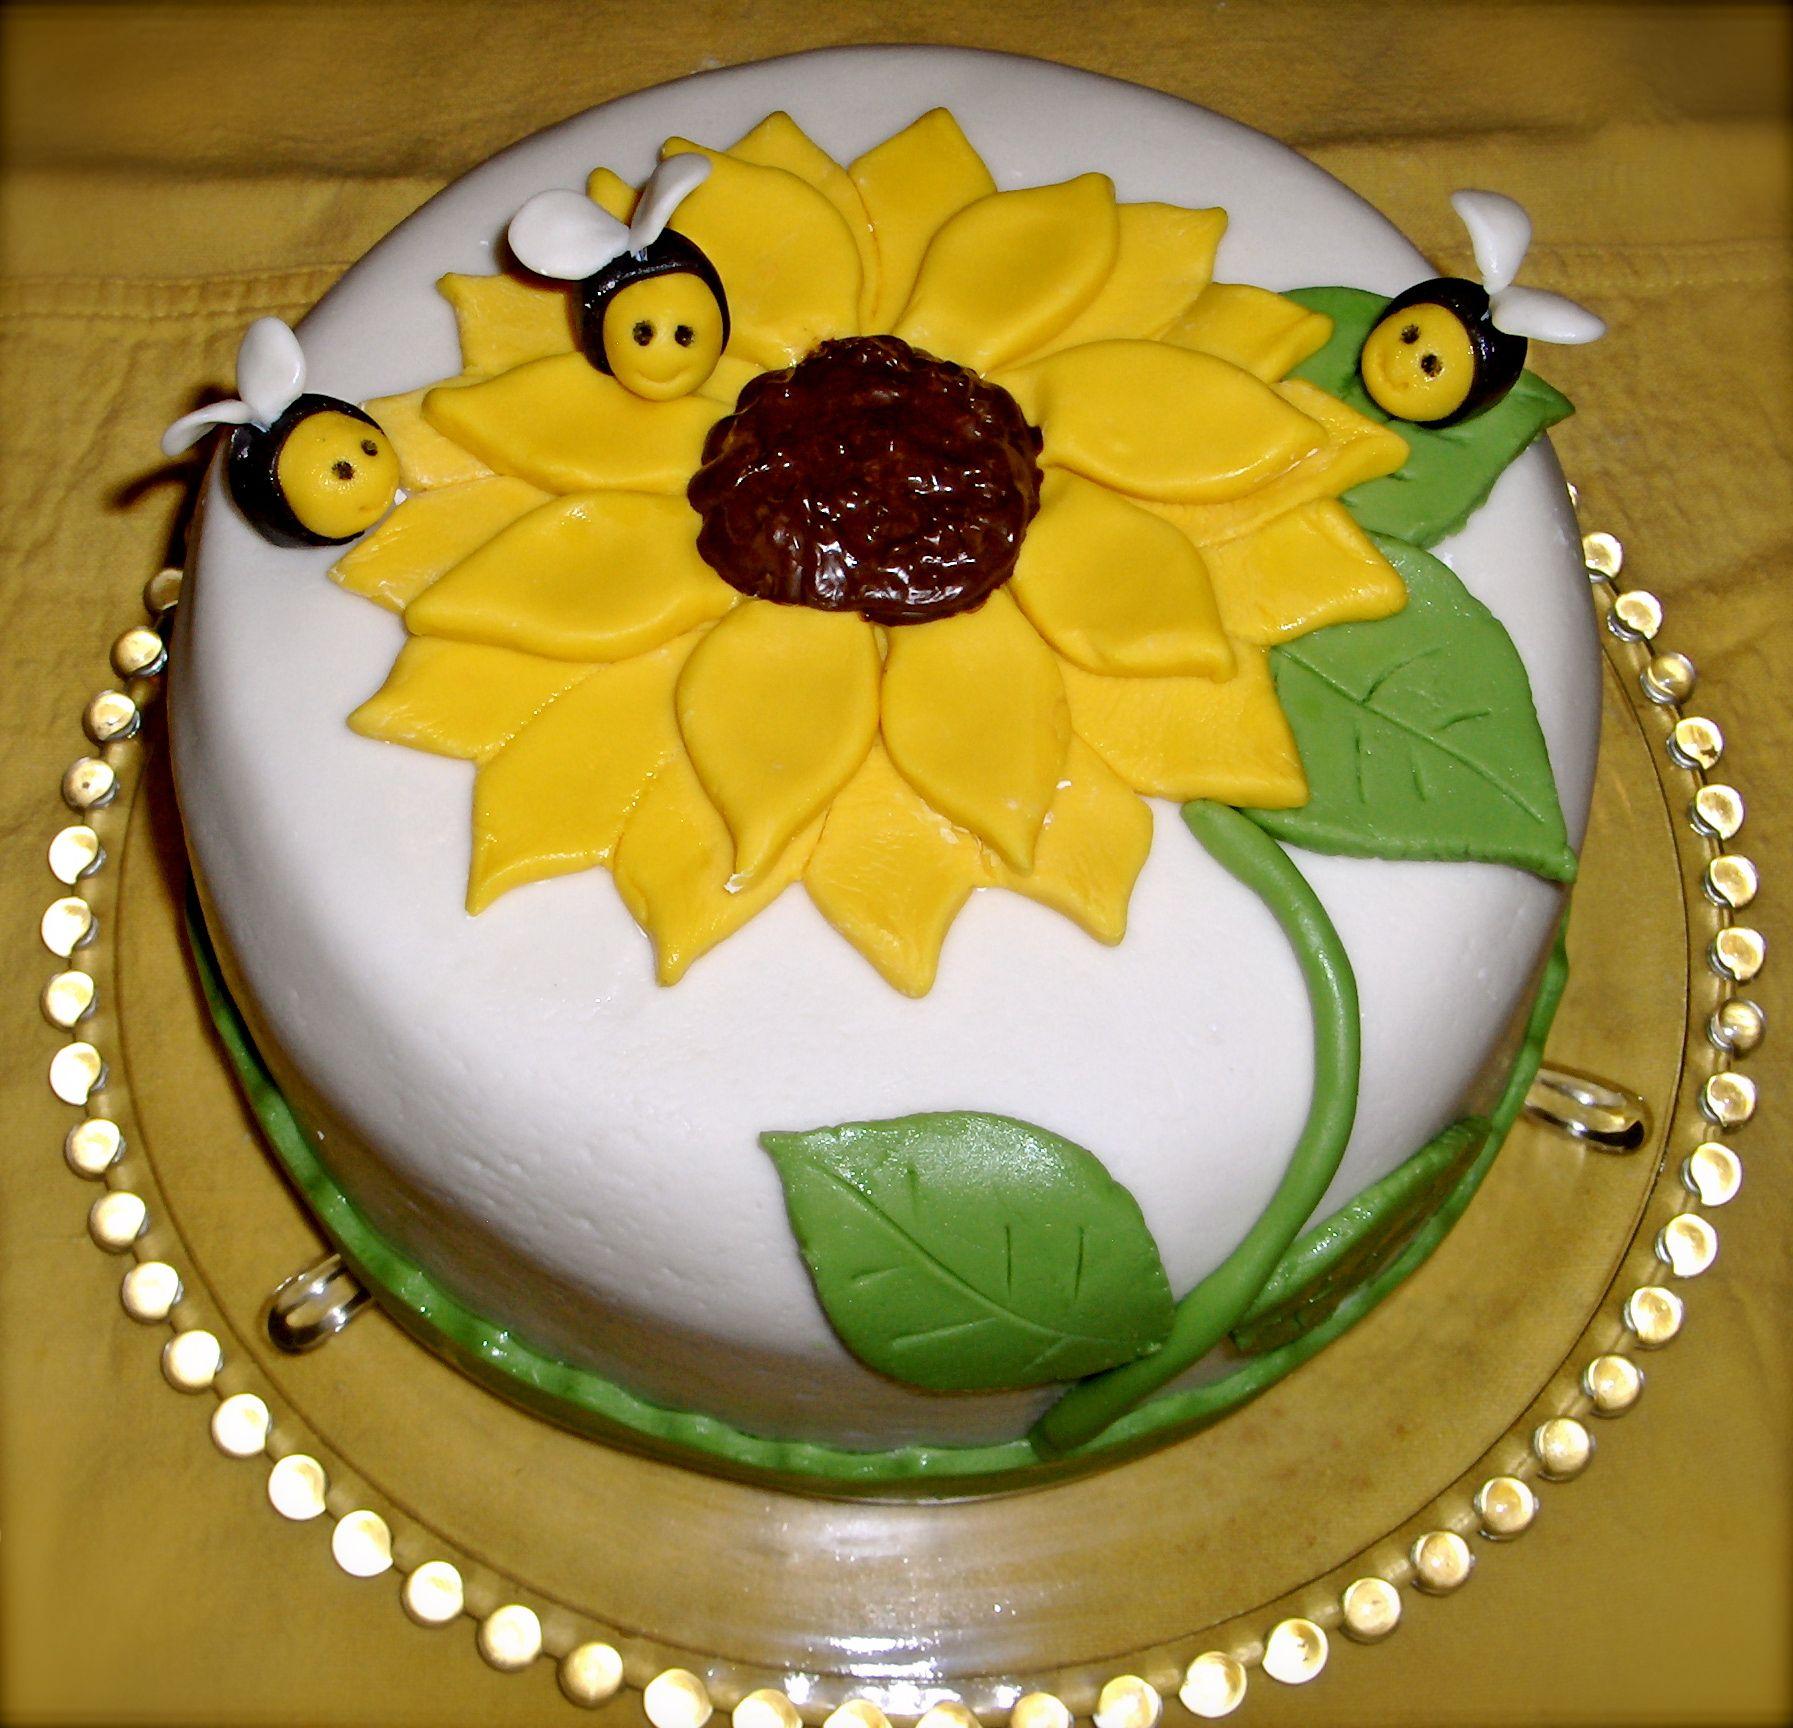 sunflower cake - Google Search | Sweet inspirations ...